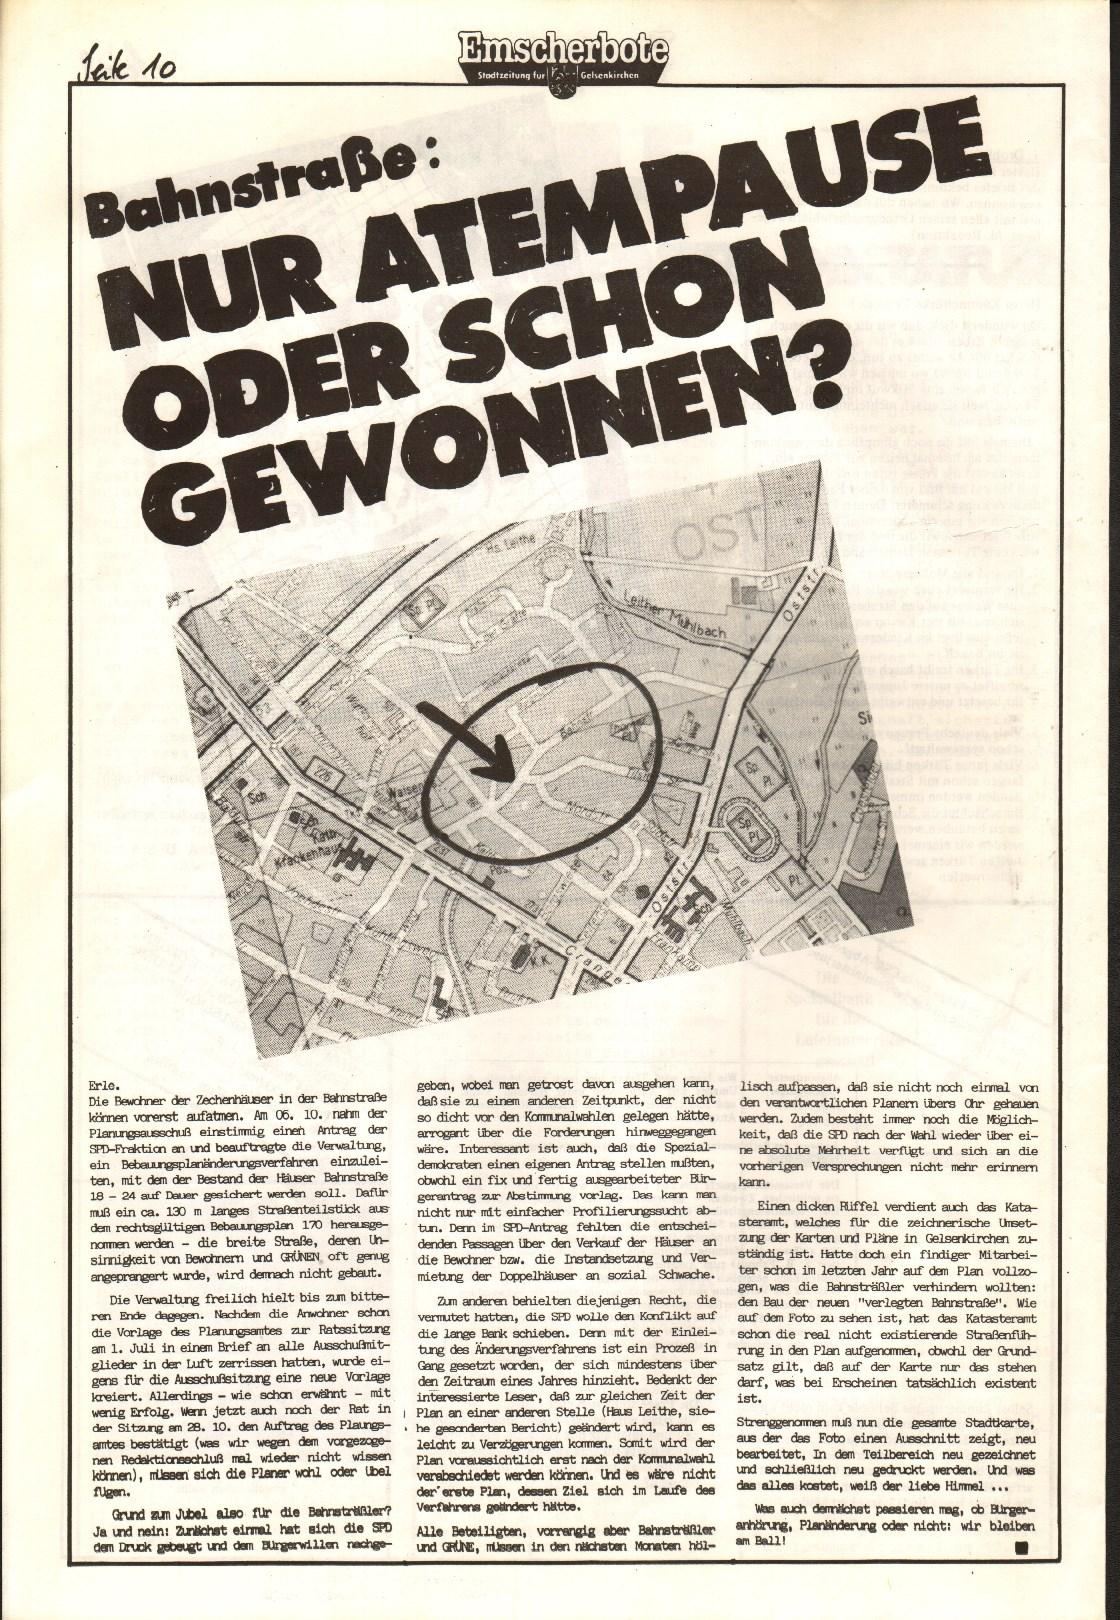 Gelsenkirchen_Emscherbote_1983_33_10